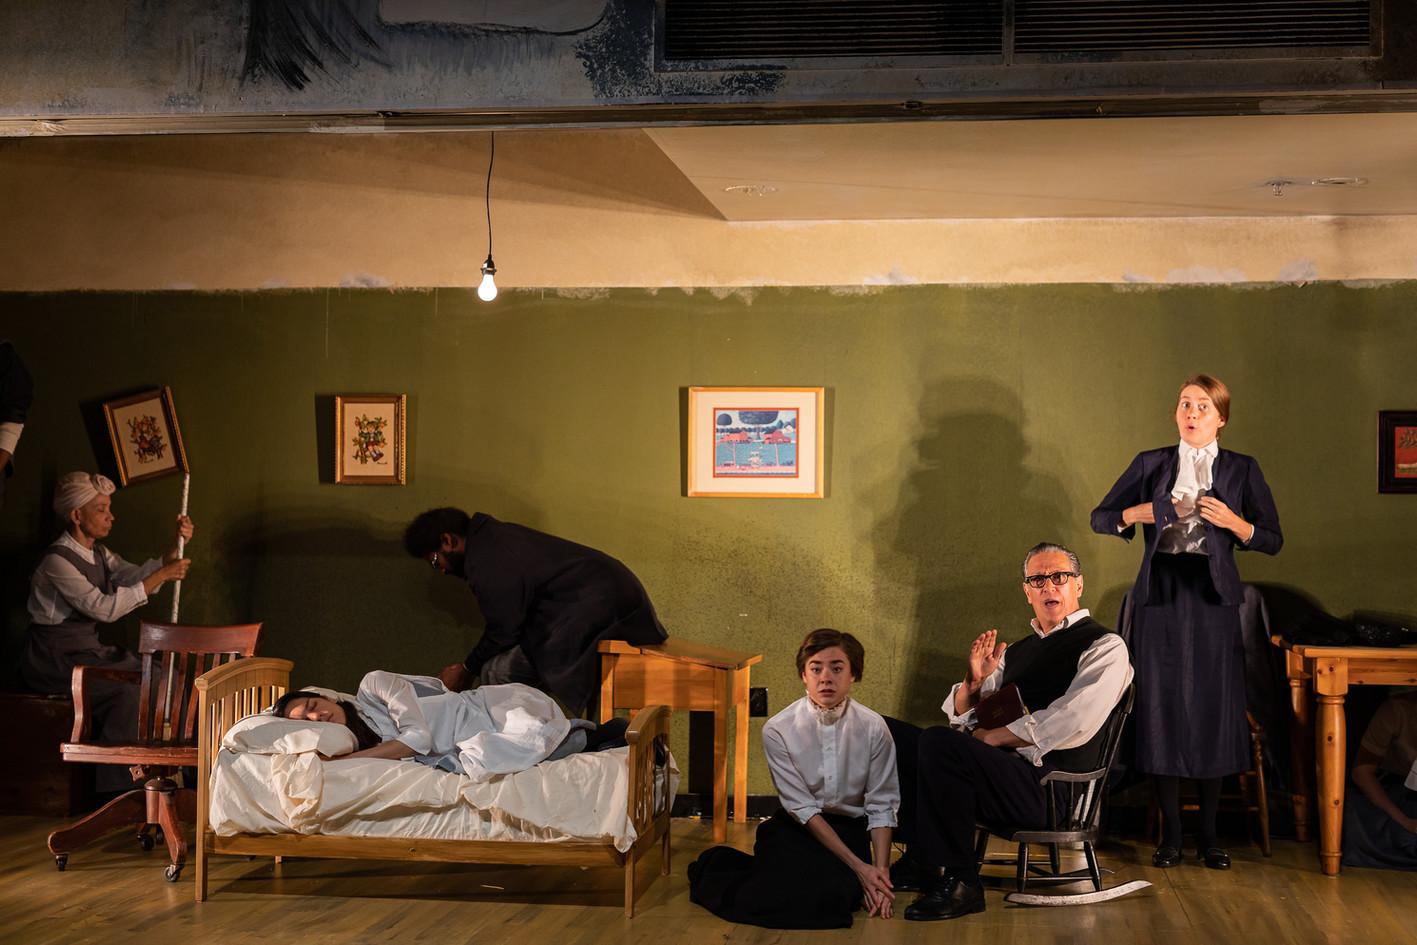 The Crucible: BEDLAM and The Nora Theatre Company, Cambridge, MA  (photo: Niles Scott Studios)